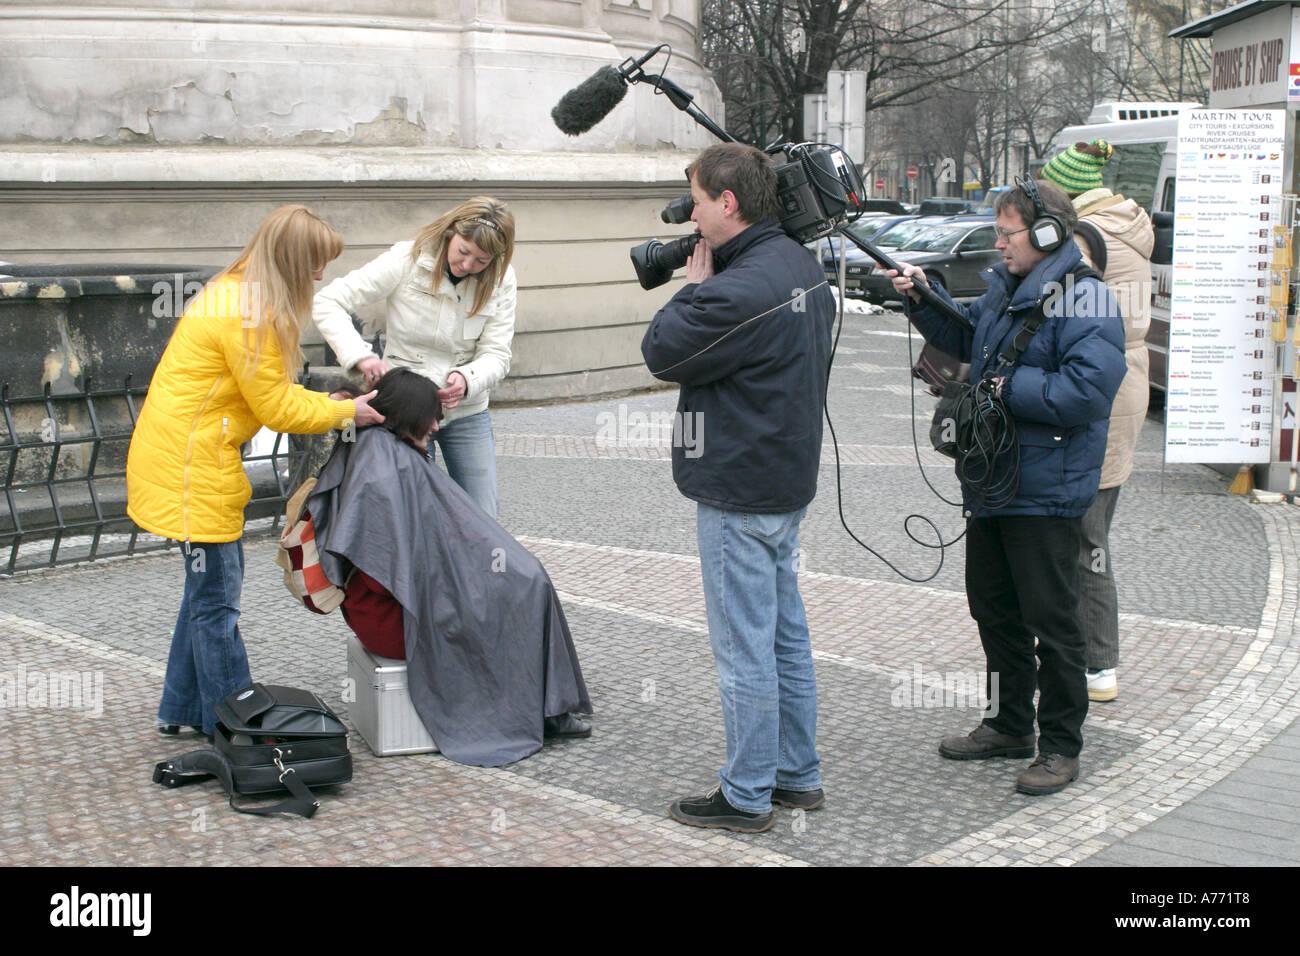 Film Camera Crew Prague March 2006 Stock Photo